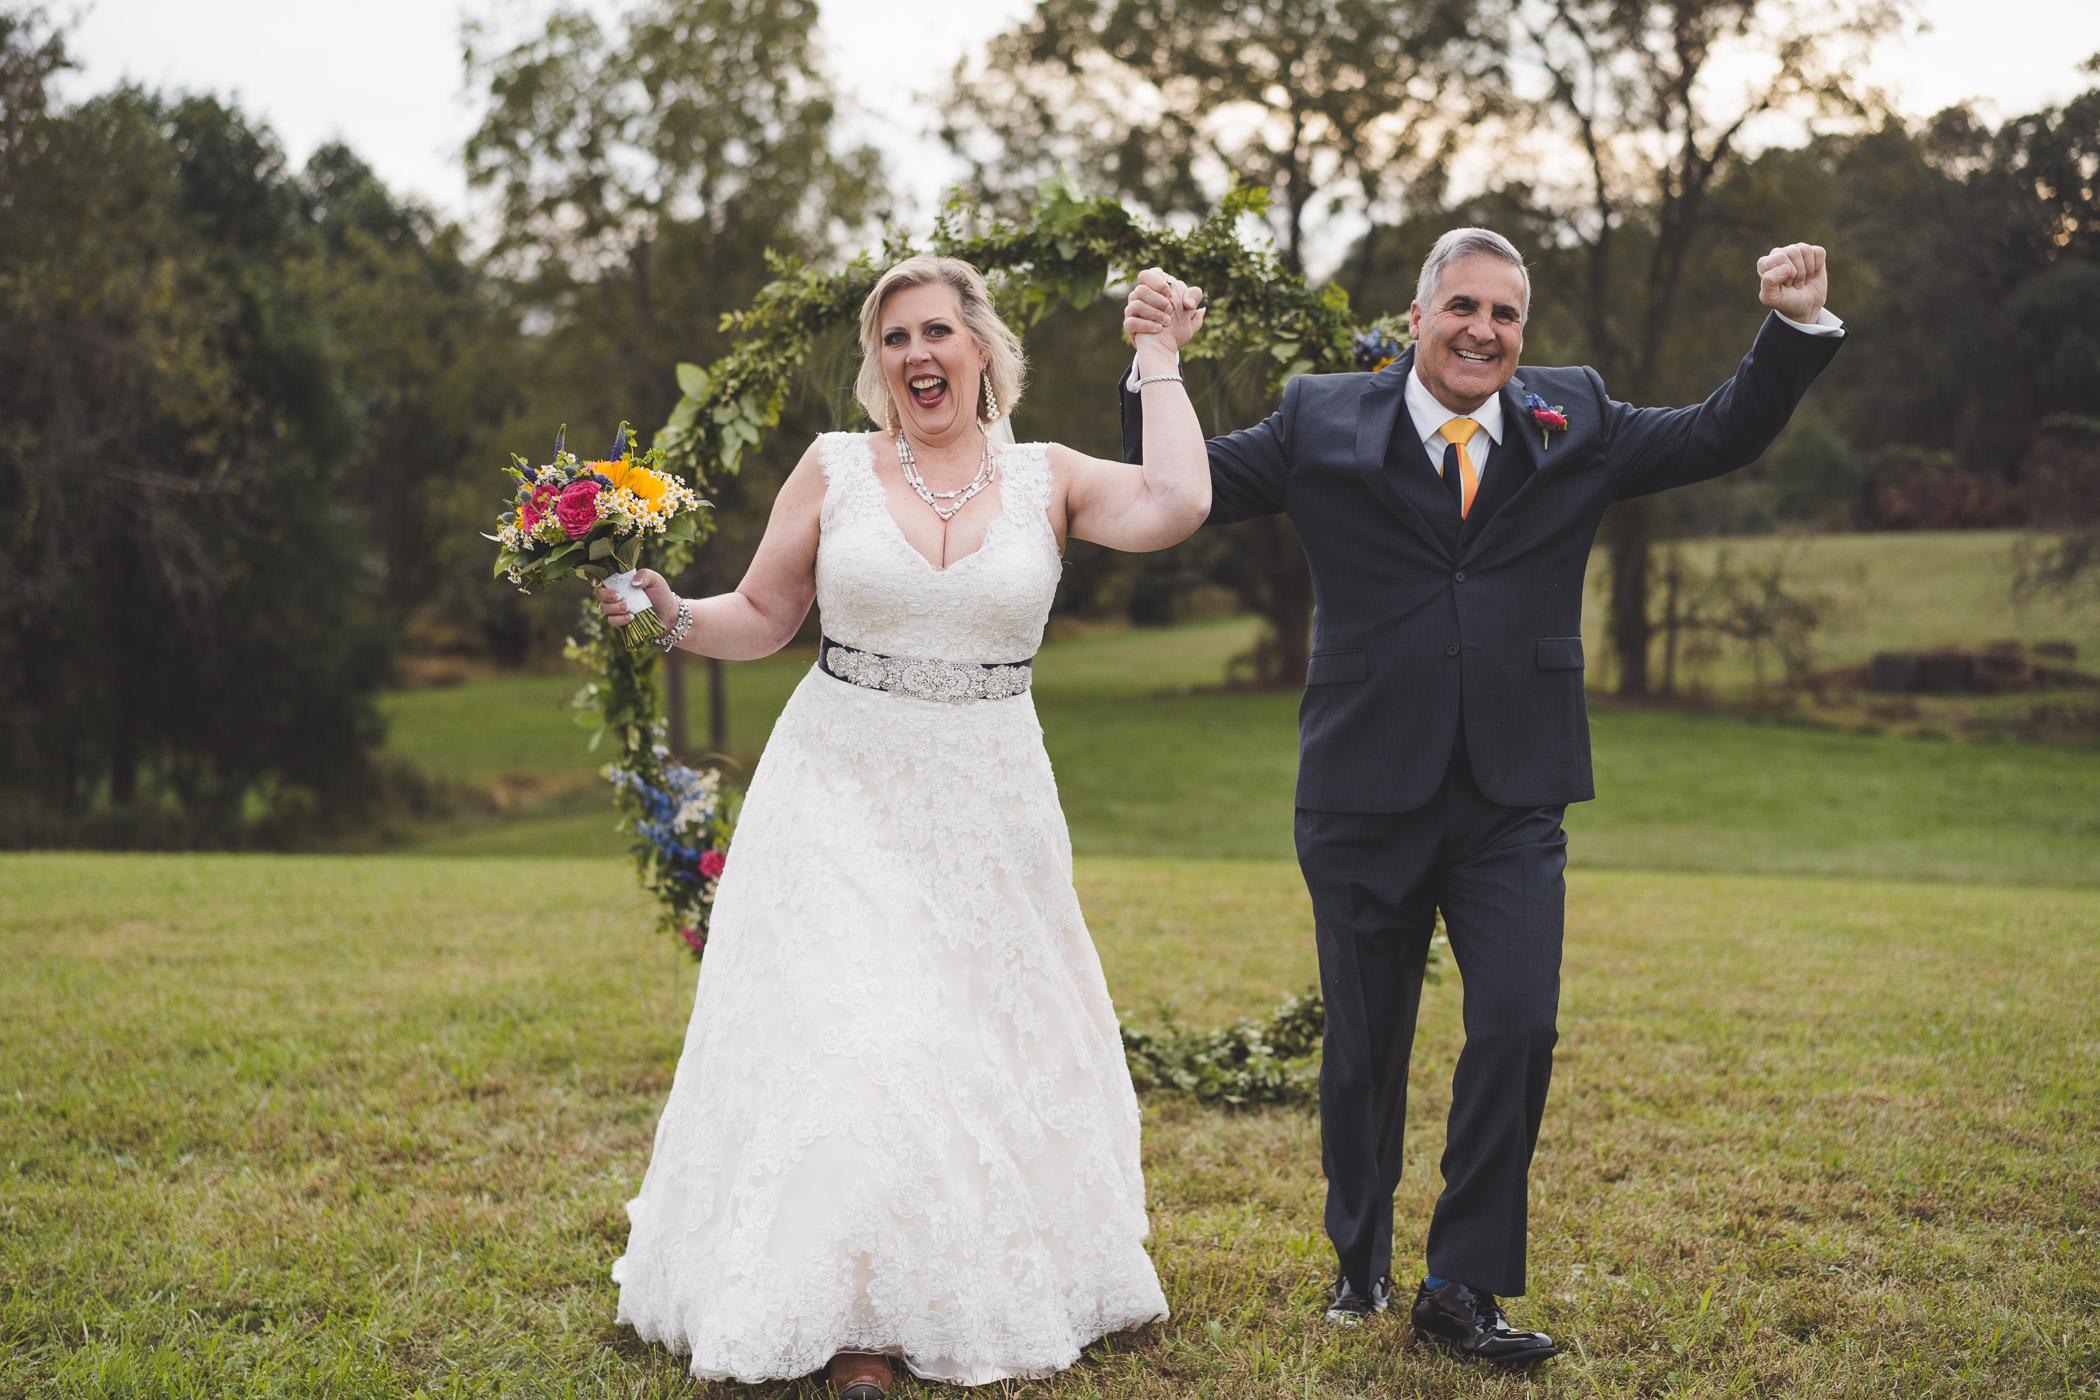 18-Faux Wedding-brandon shane warren-27.jpg